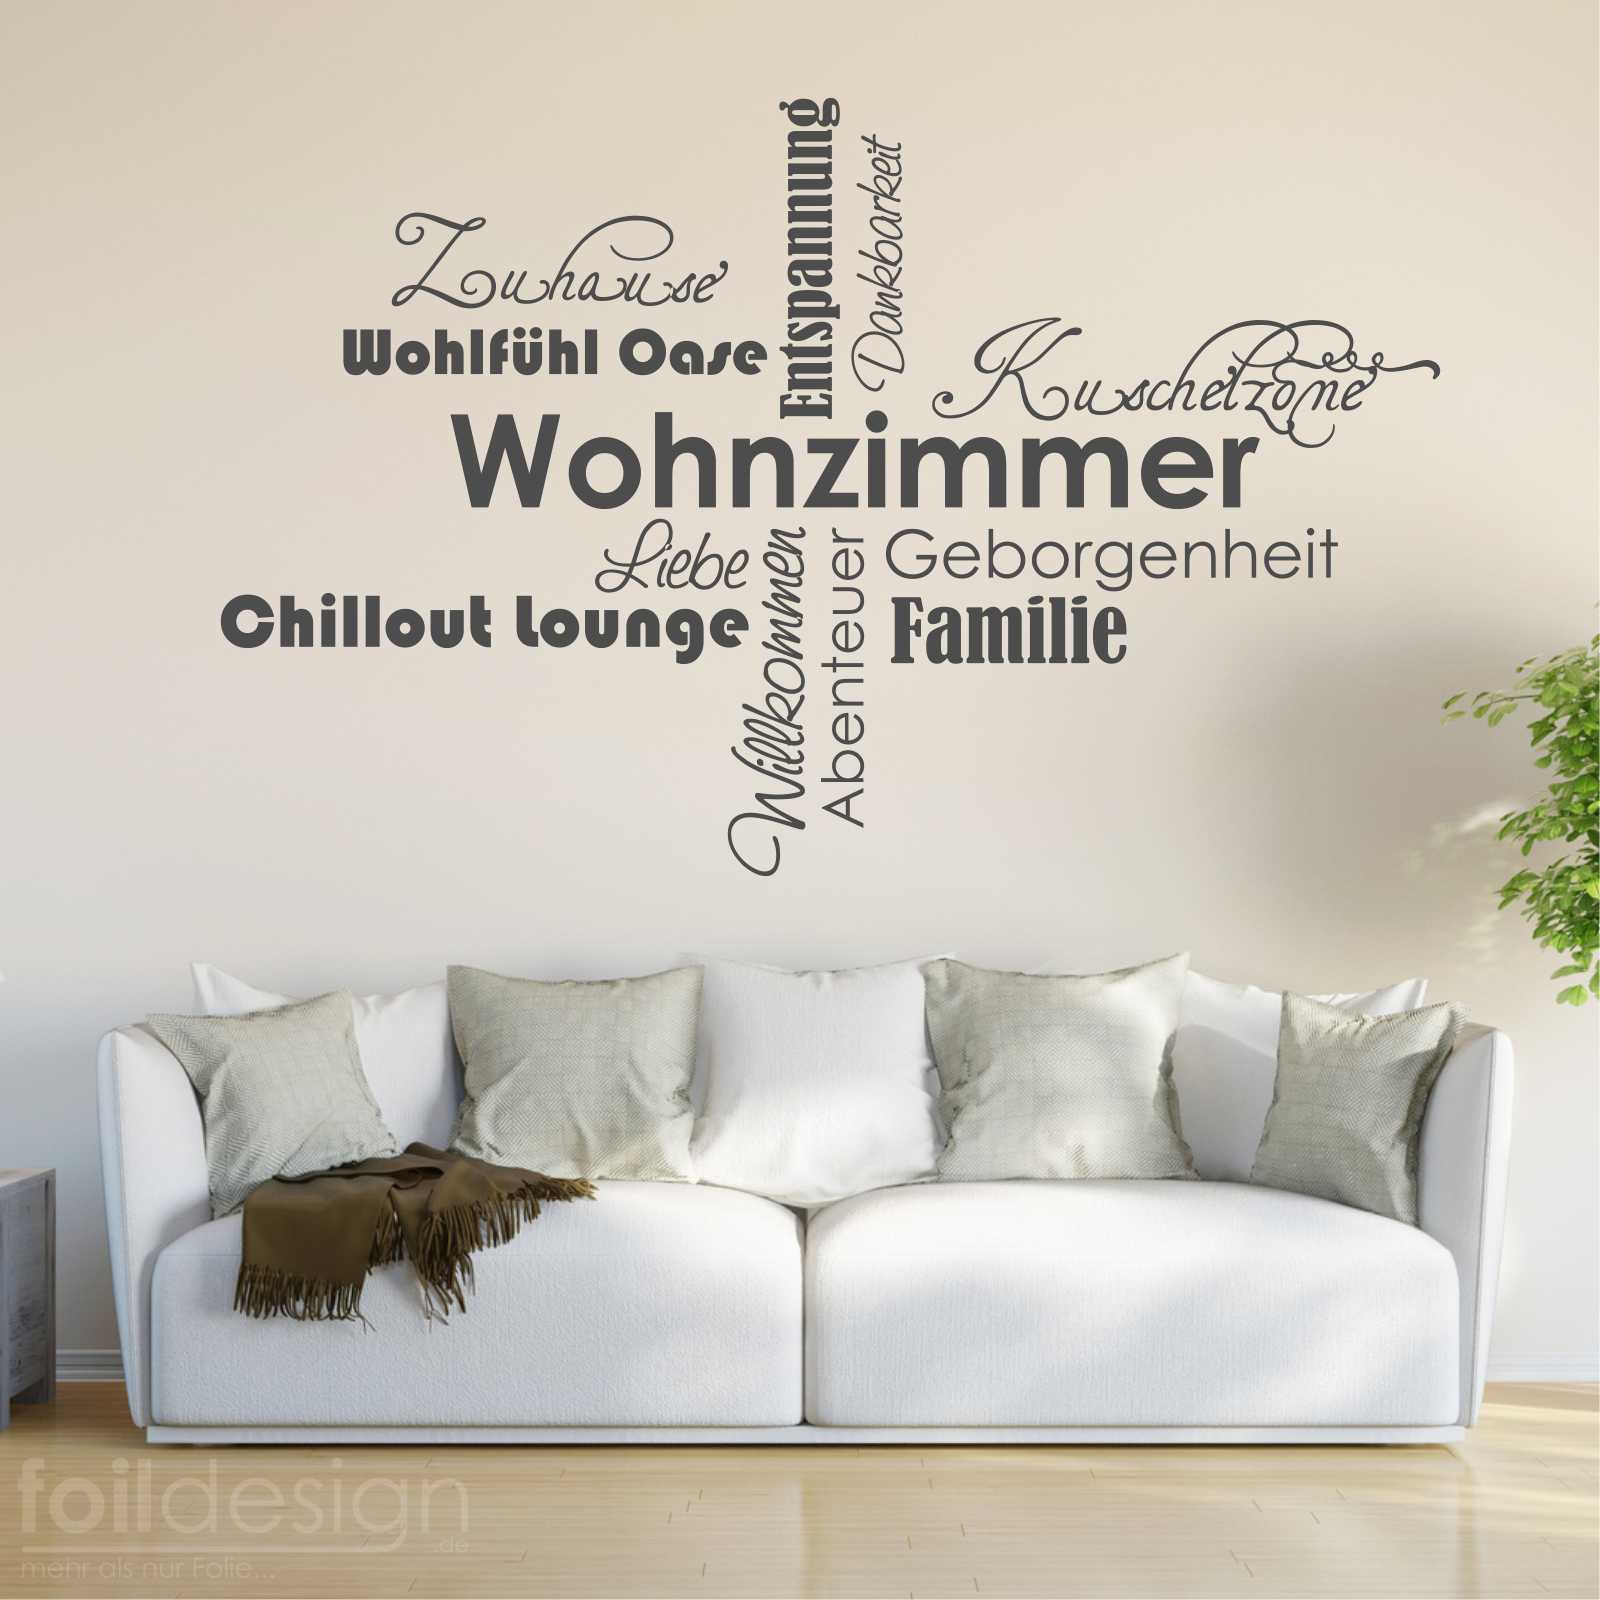 Wandtattoo Wandsticker Wandaufkleber Bei uns Zuhause Familie Wohnzimmer  WT049